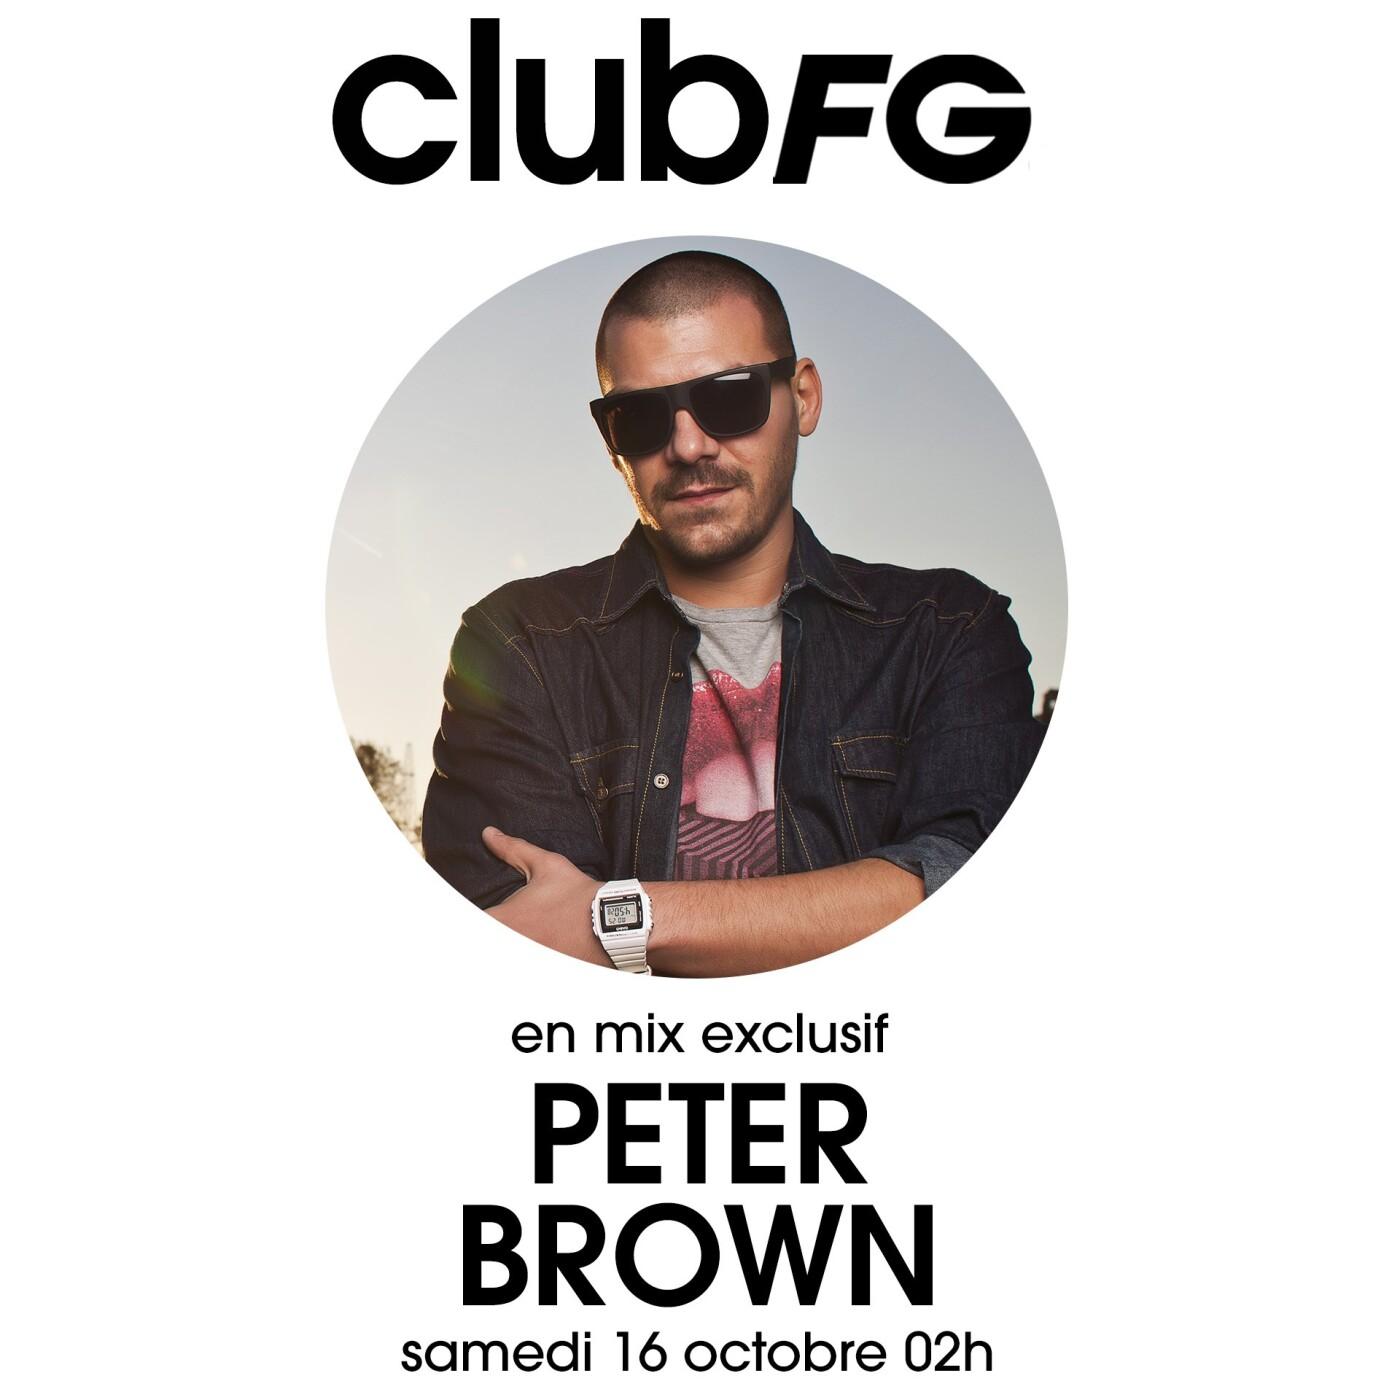 CLUB FG : PETER BROWN